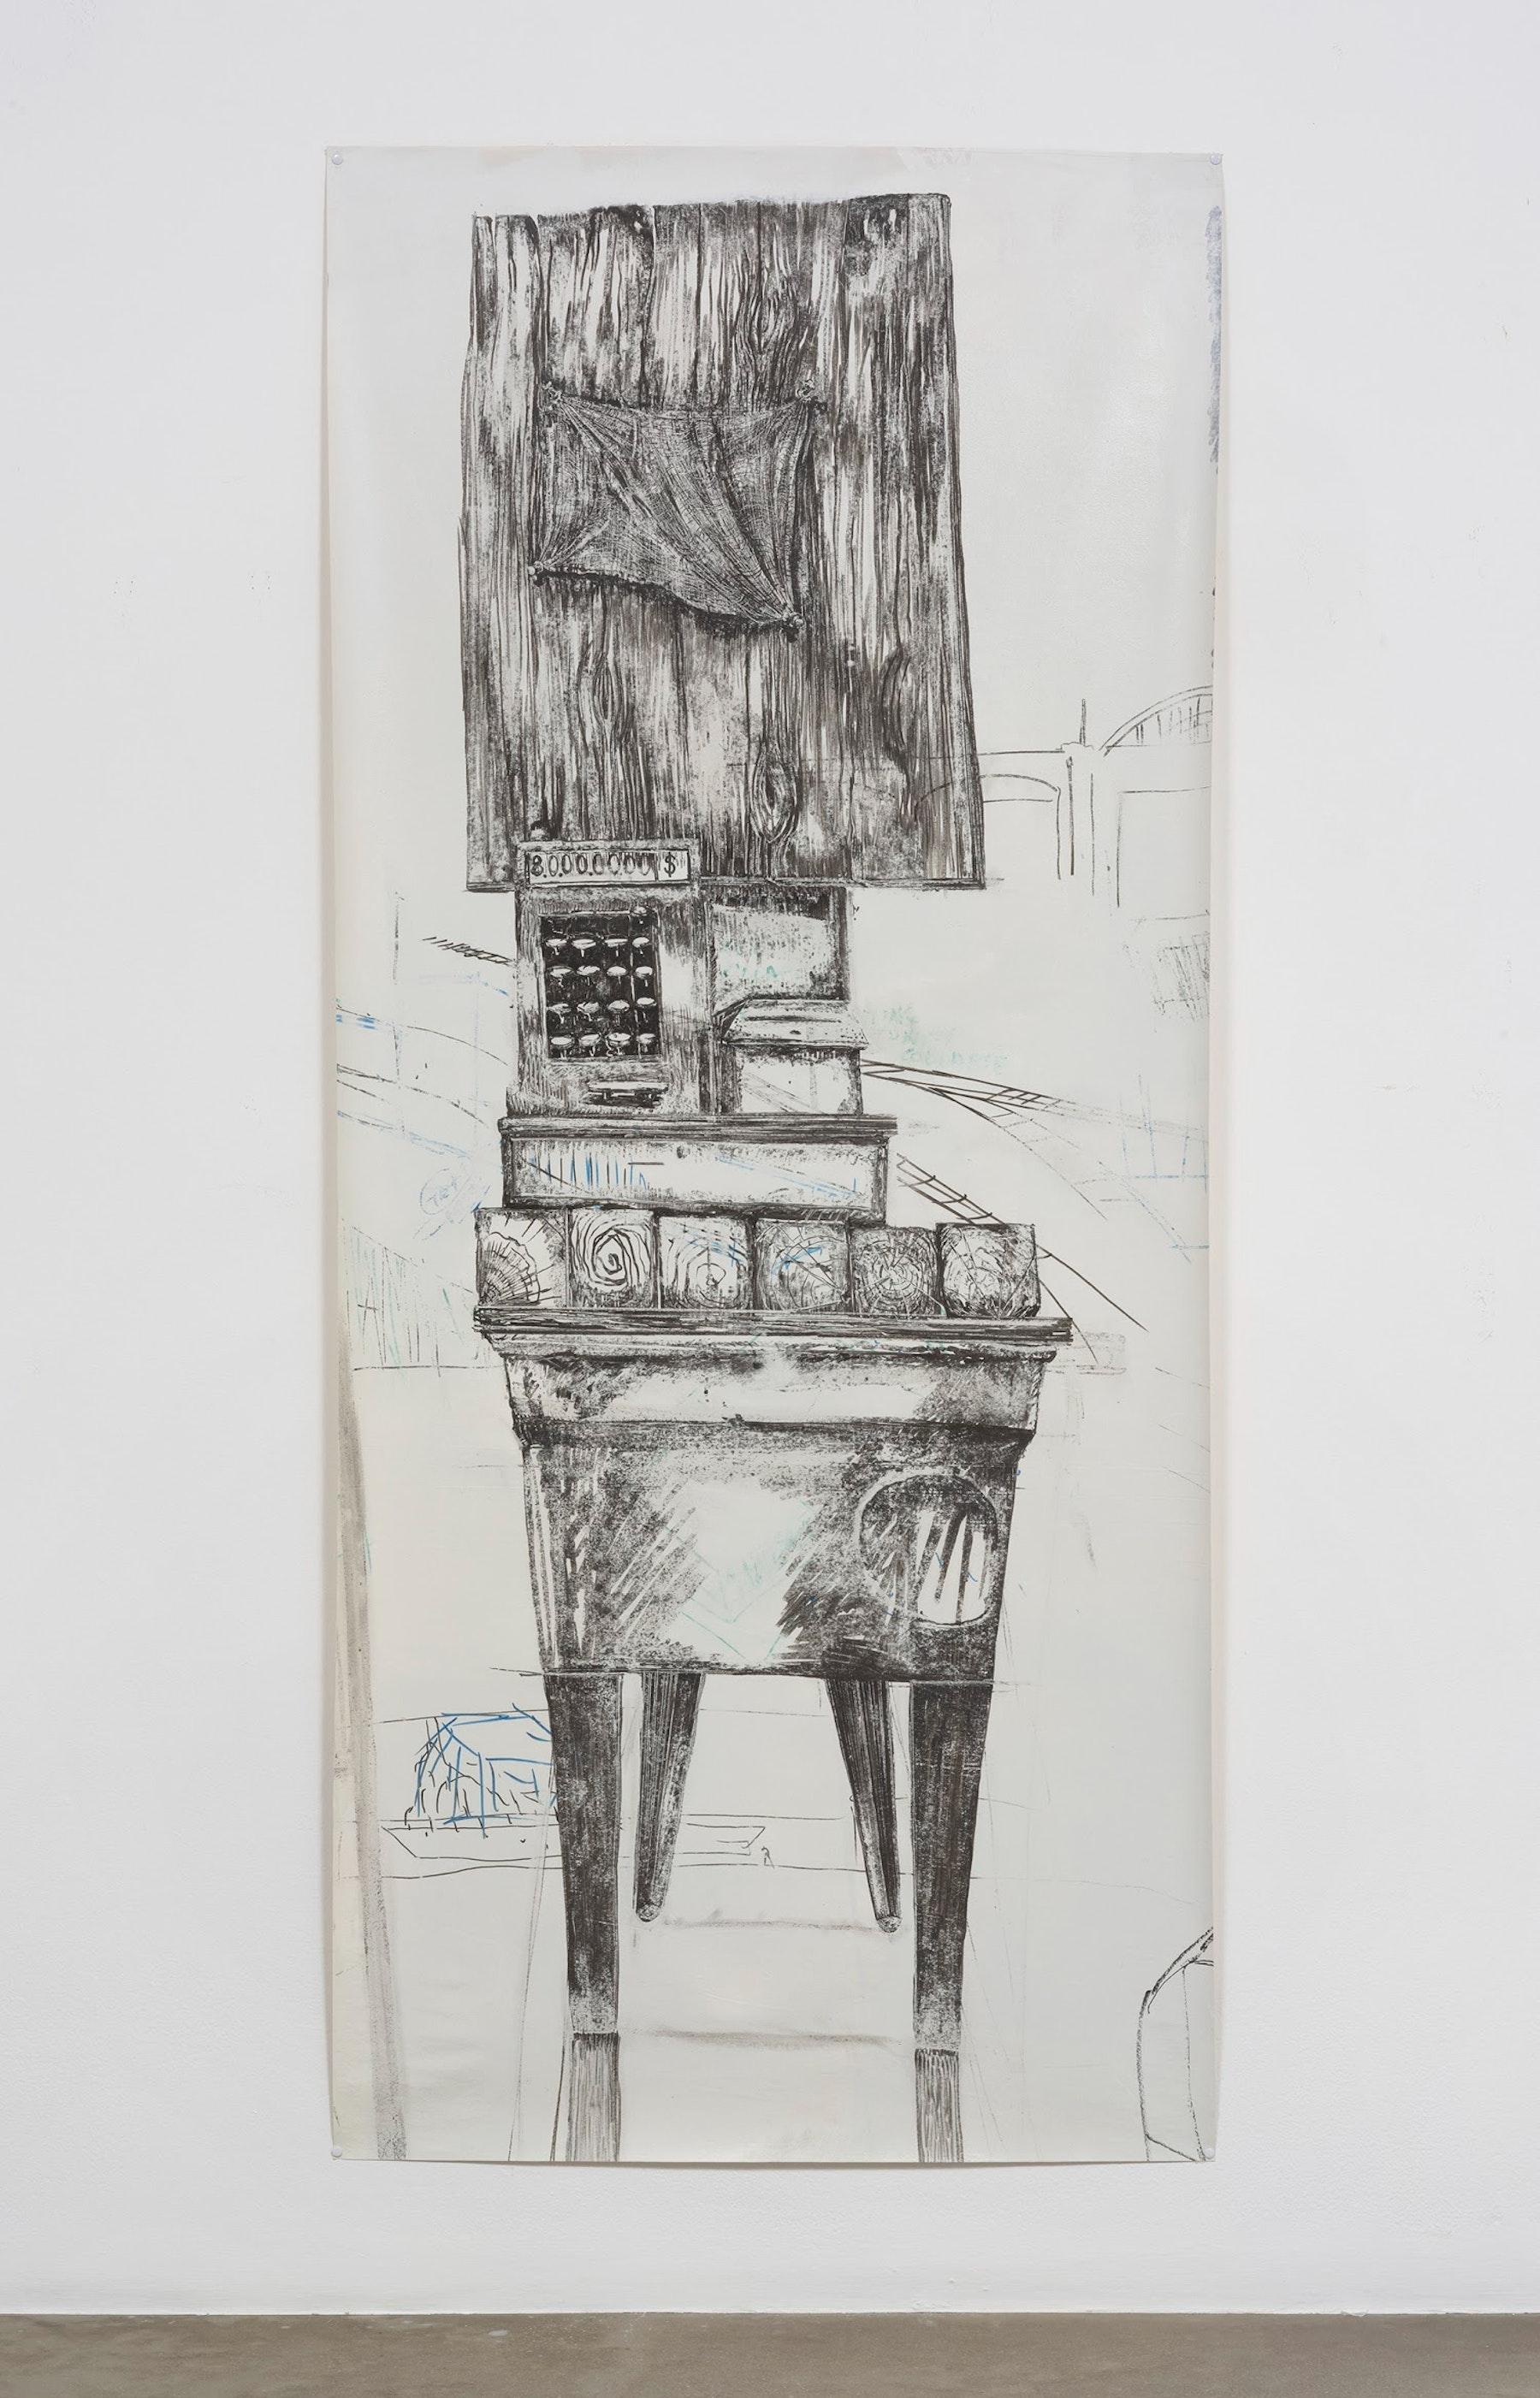 "Edgar Arceneaux ""Migrant's Totem I,"" 2017 Dry erase pen on muslin 79"" x 35"" [HxW] (200.66 x 88.9 cm) Inventory #ARC566 Courtesy of the artist and Vielmetter Los Angeles Photo credit: Jeff McLane"